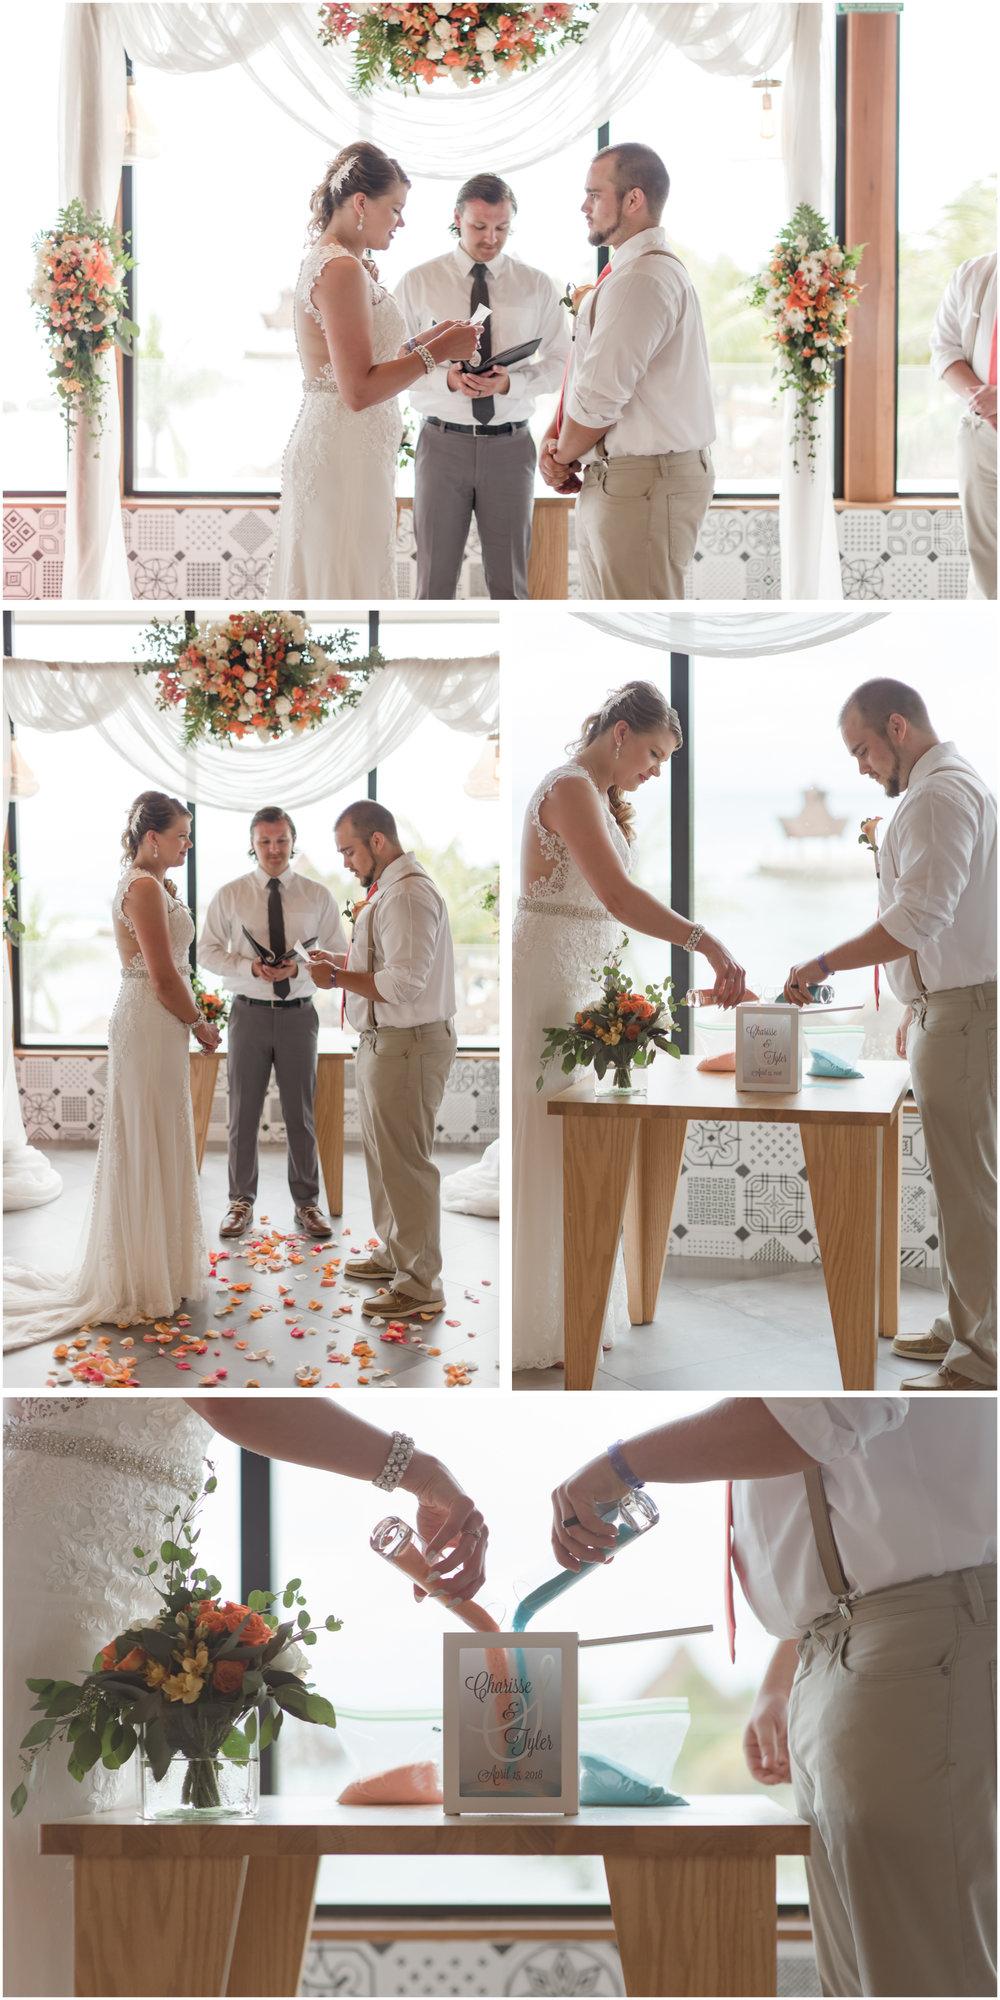 sand ceremony at a destination wedding